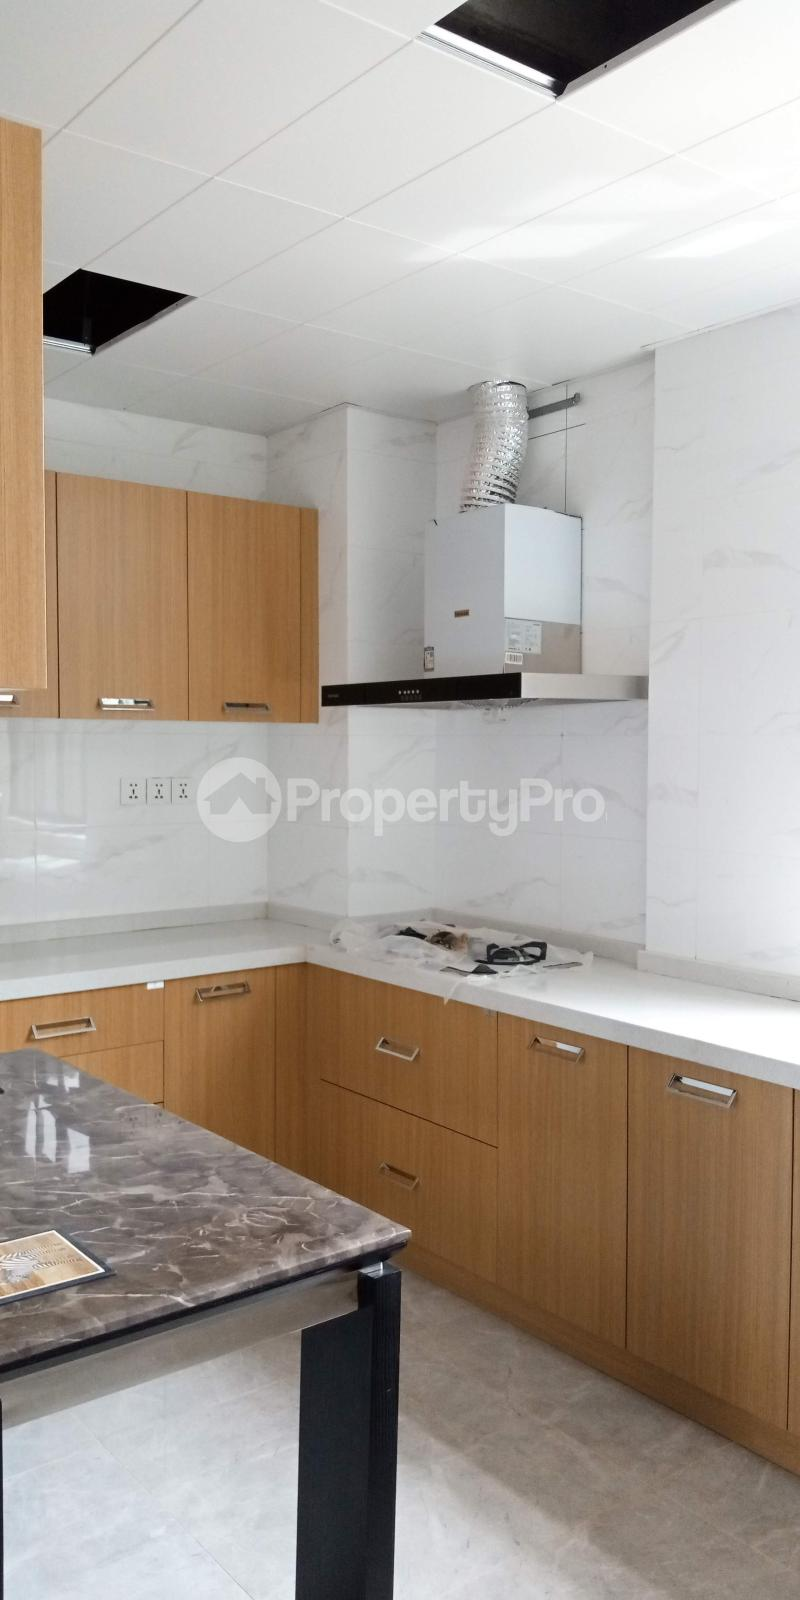 3 bedroom Apartment for rent Naguru Kampala Central Kampala Central - 8